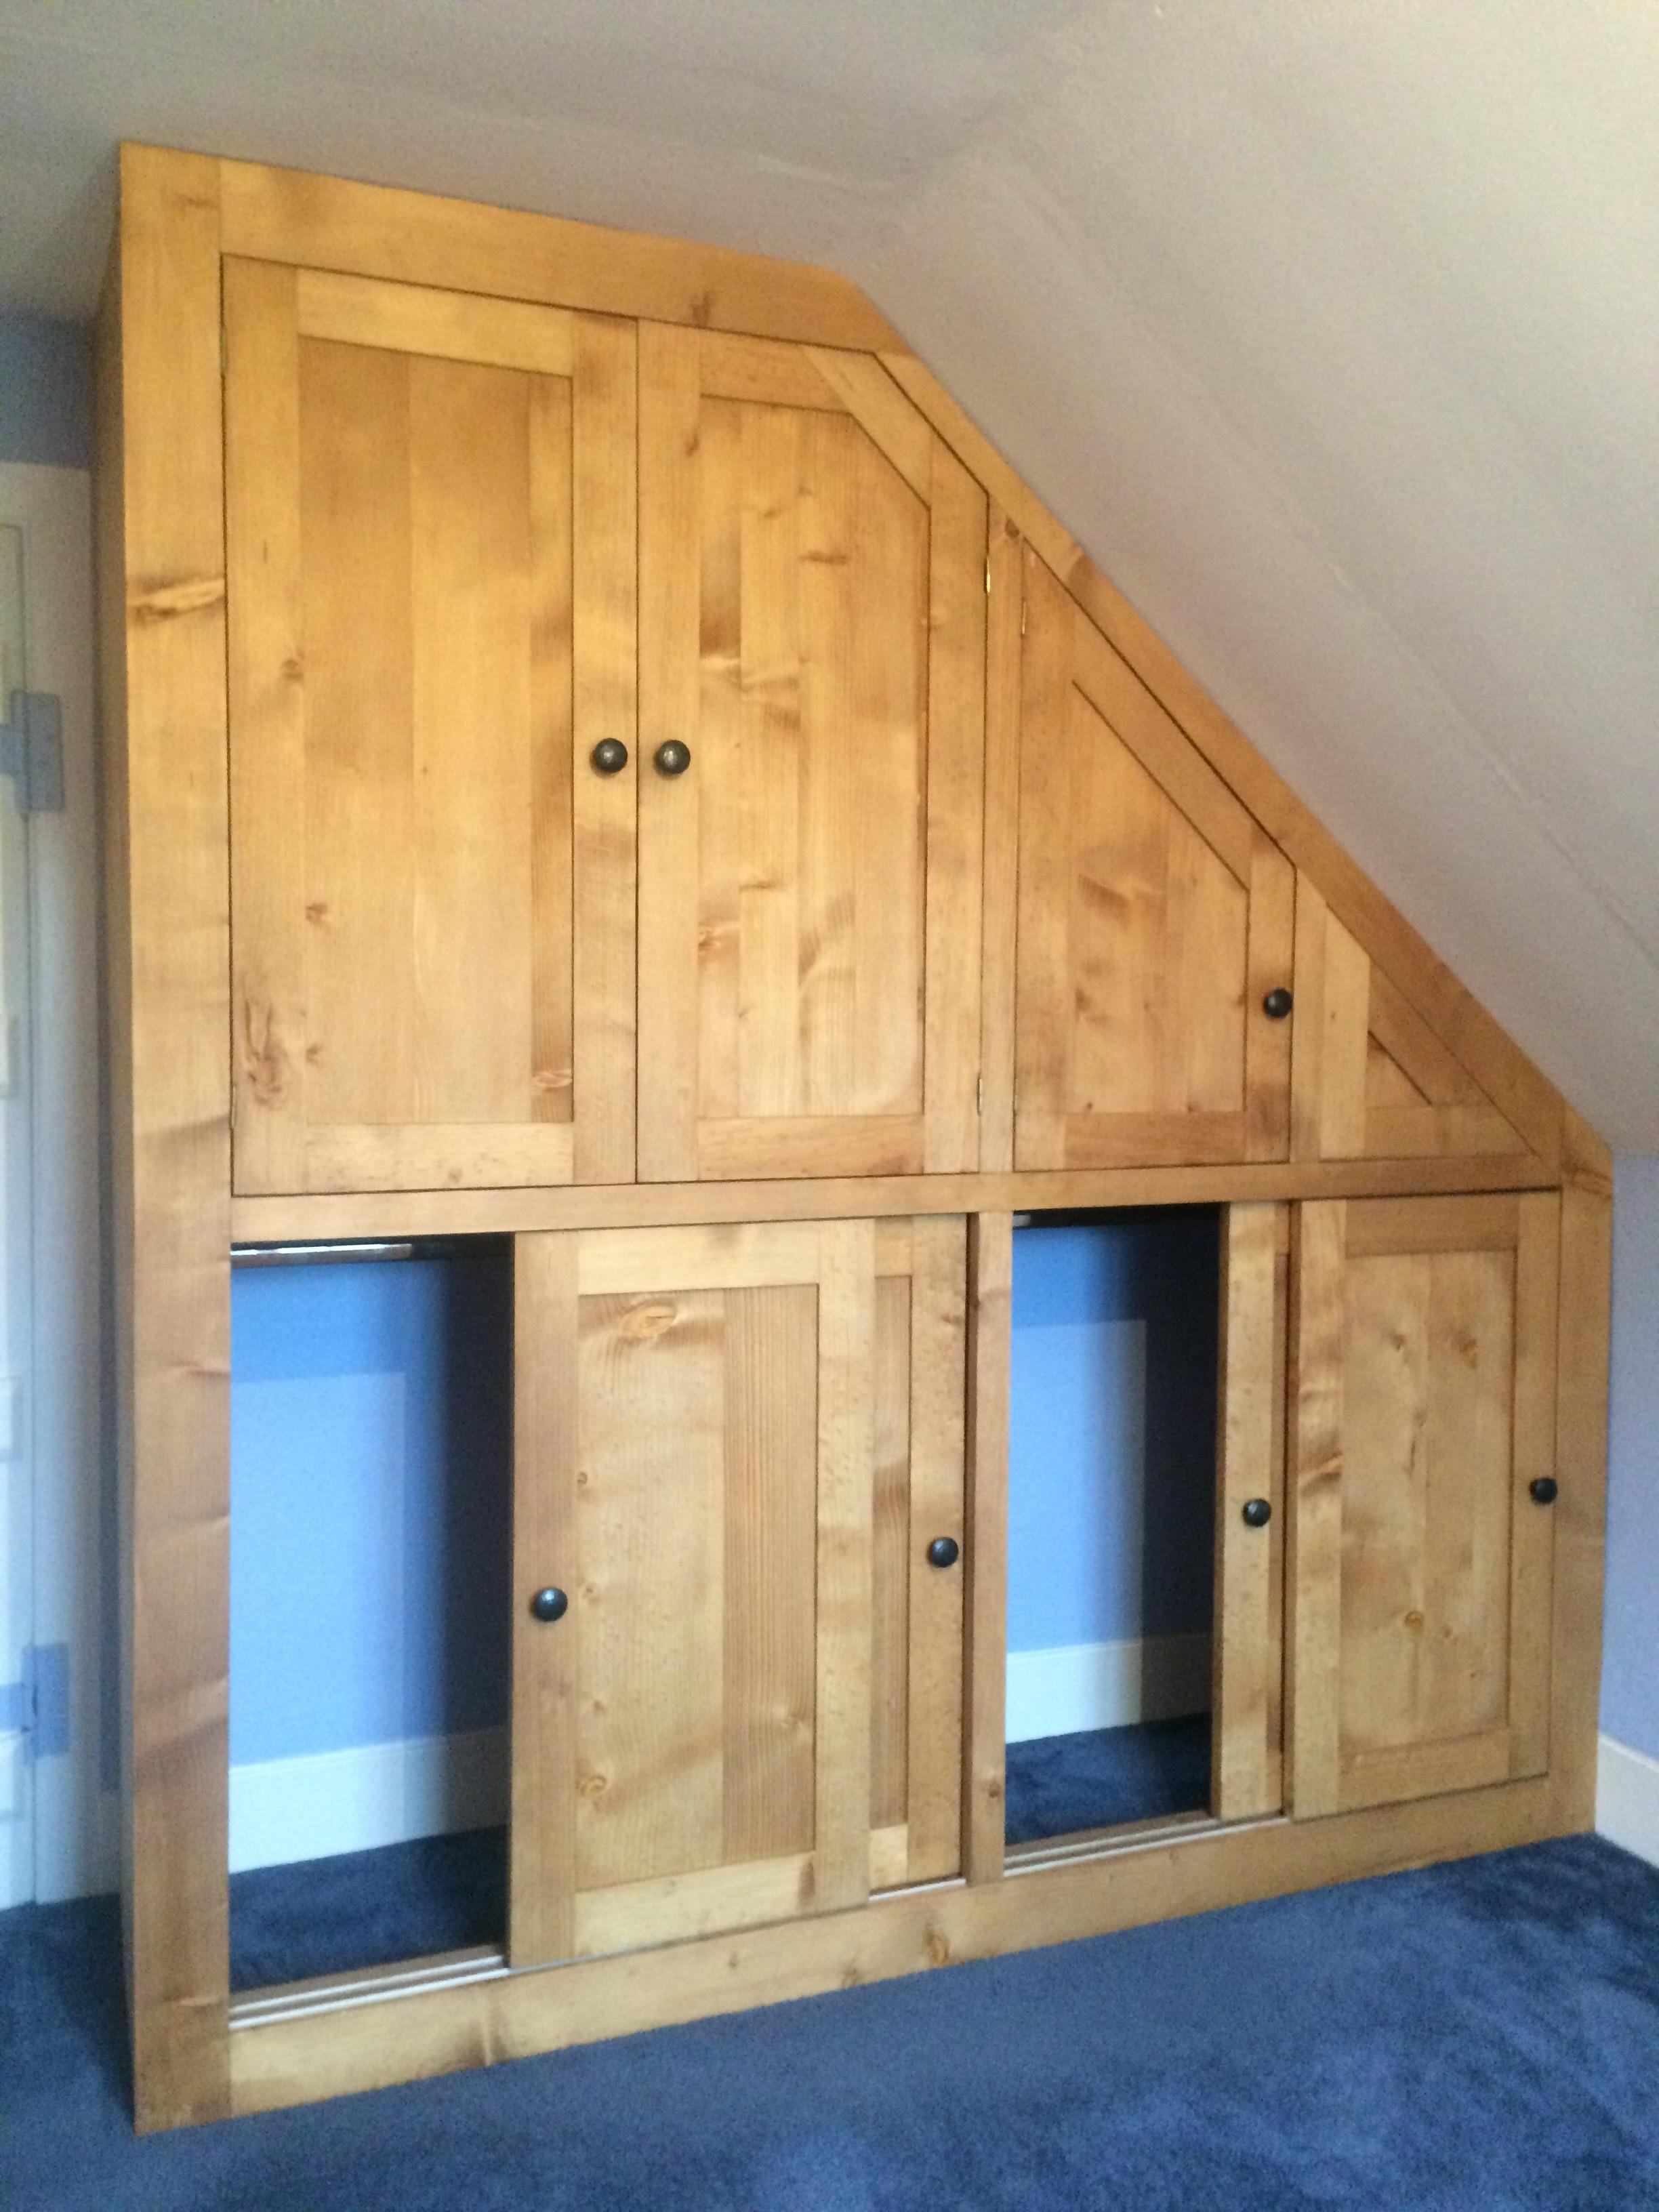 Solid Wood Built In Wardrobes Regarding Favorite Sliding Doors In This Bespoke Solid Wood Fitted Wardrobe Built (View 9 of 15)